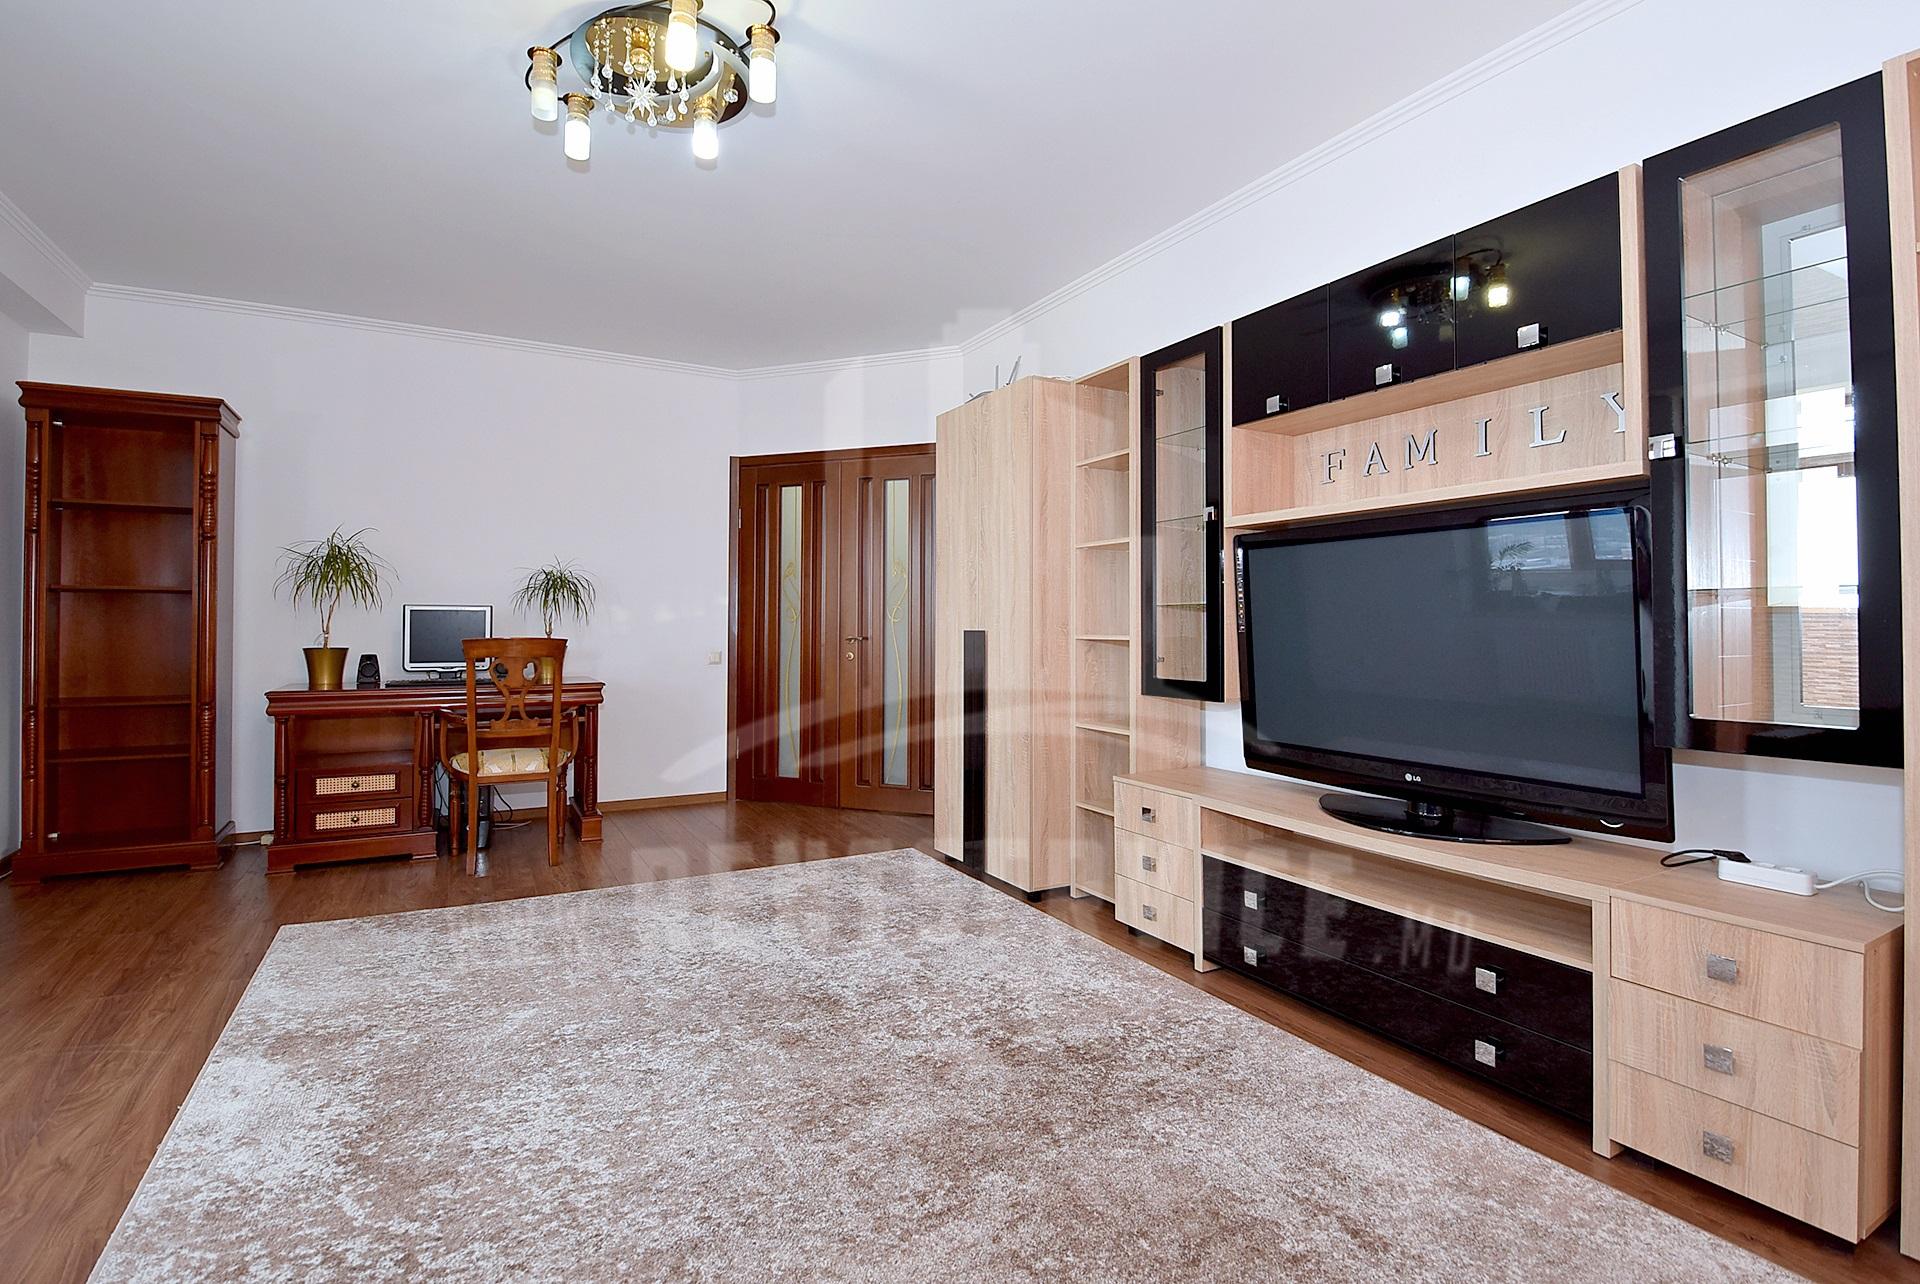 287_apartment_3.JPG